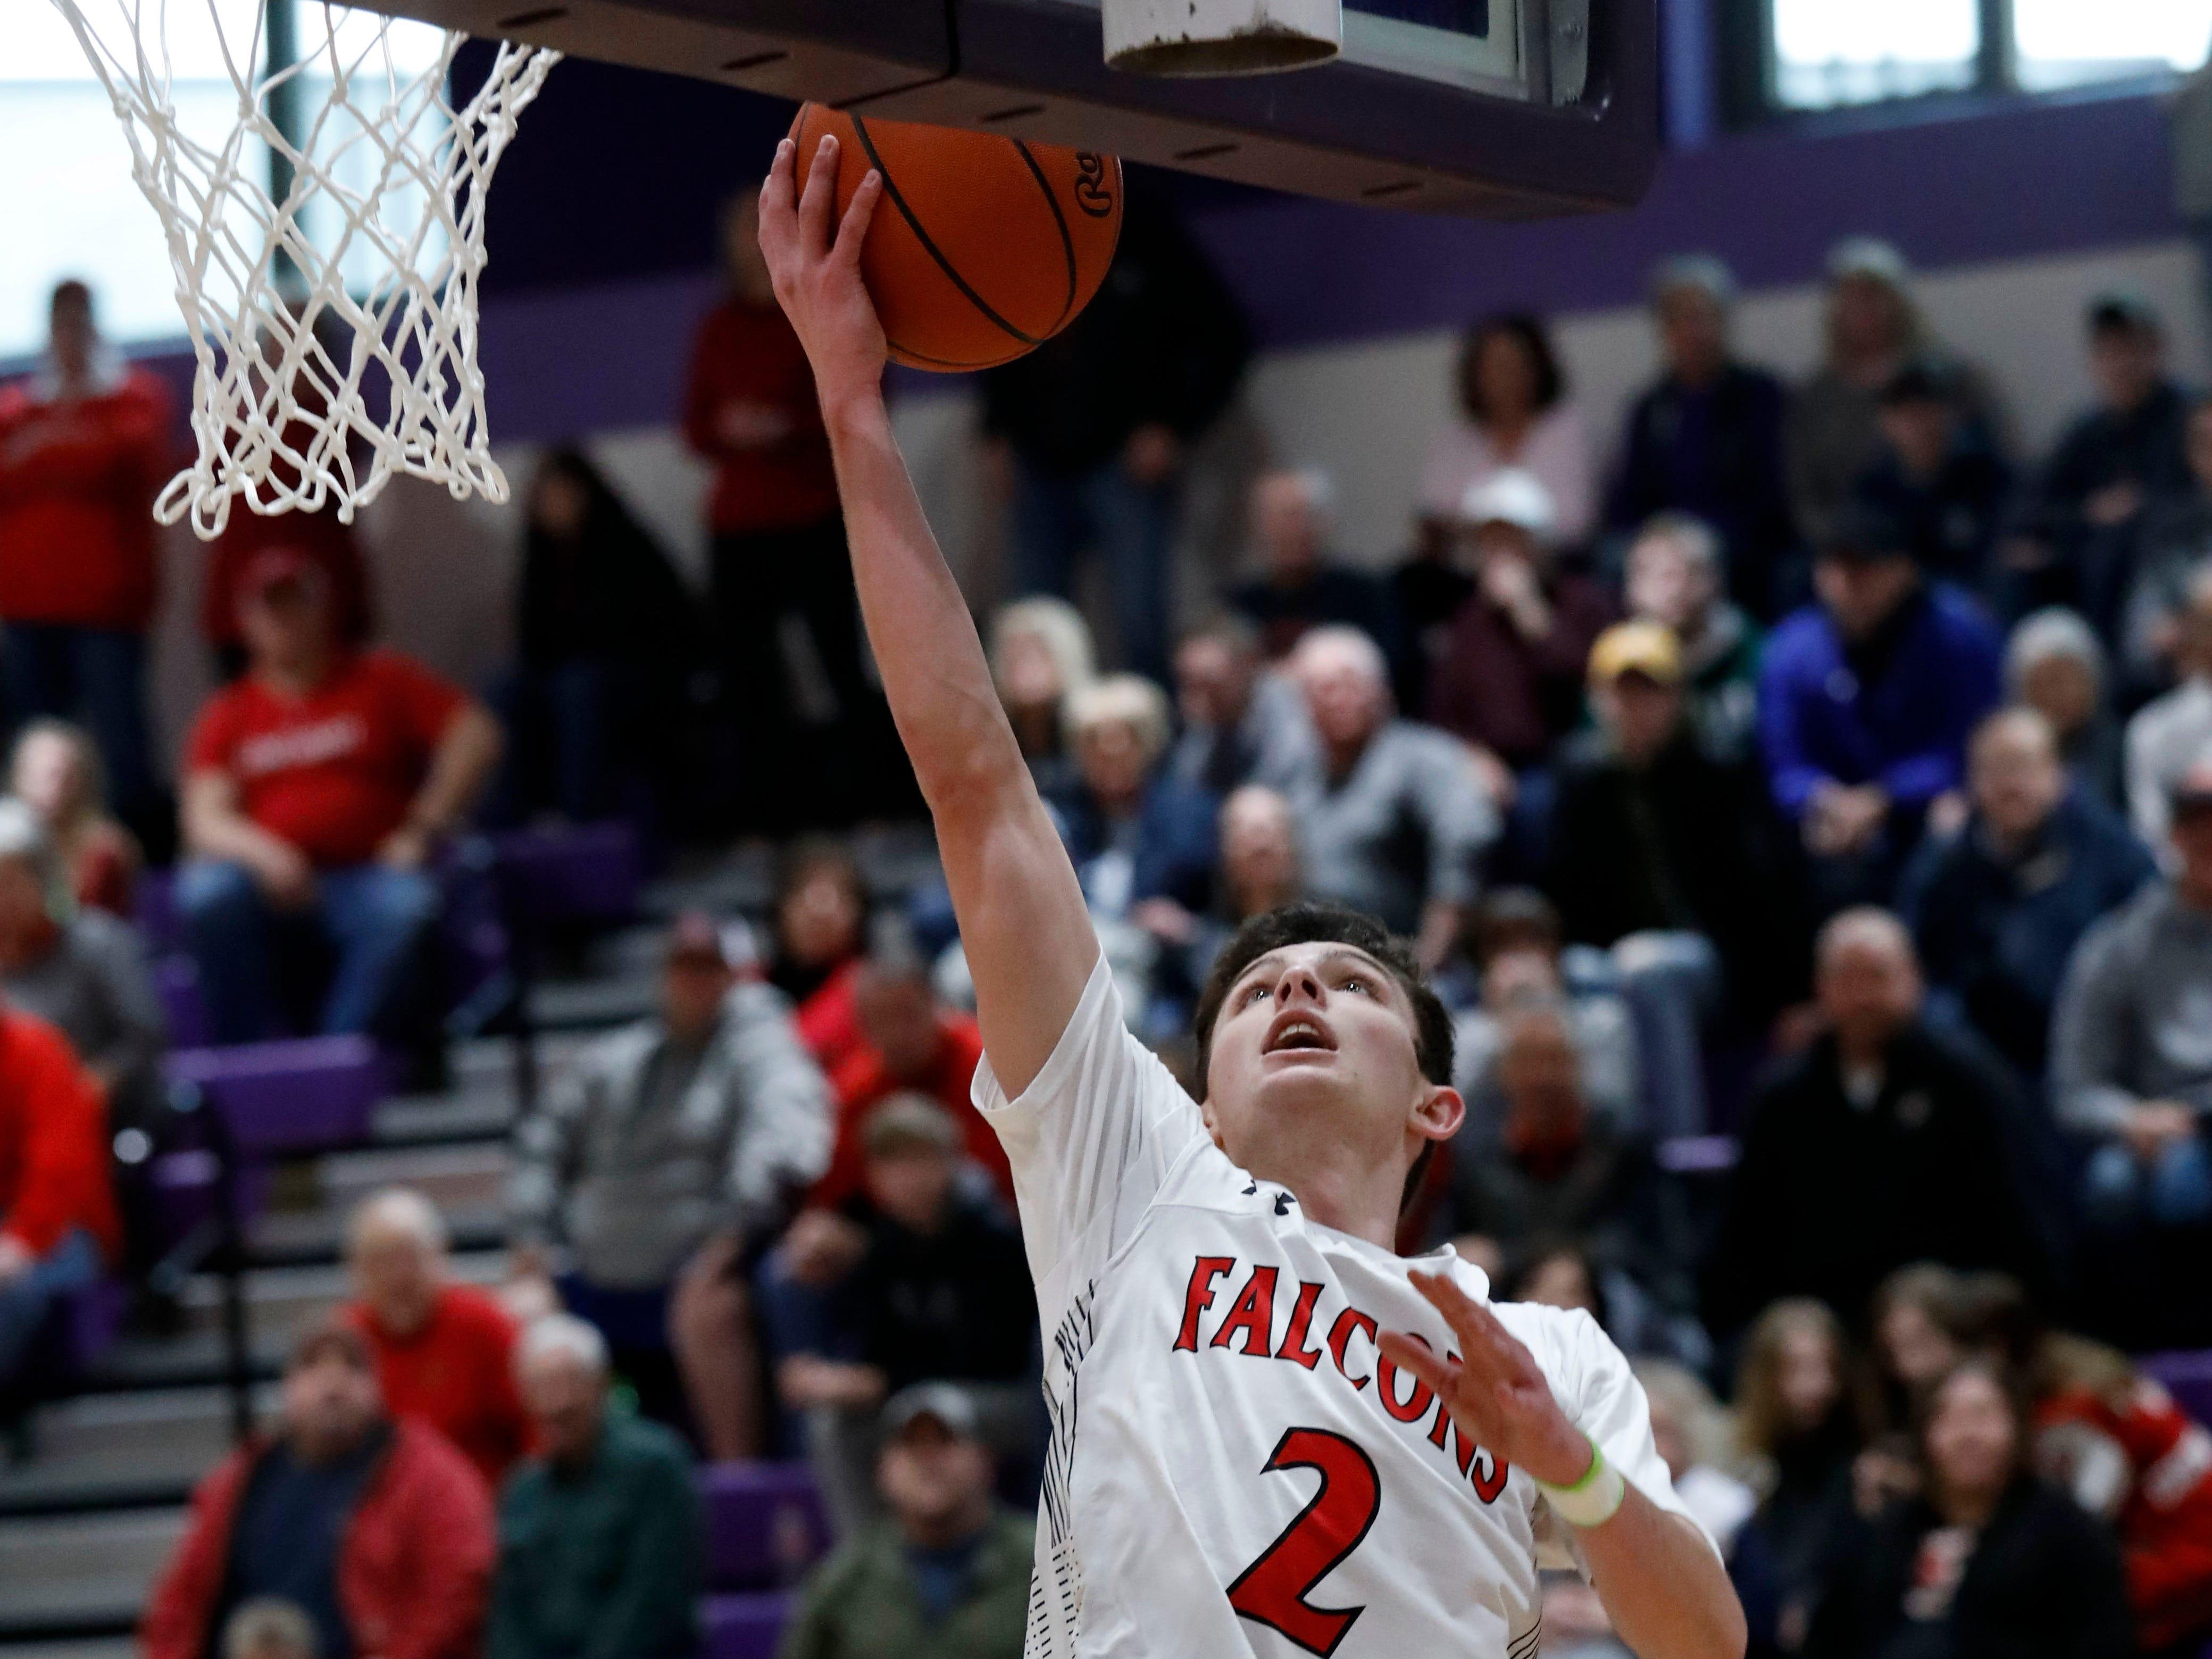 Fairfield Union's Evan Conley takes a shot during Saturday's game, Feb. 23, 2019, at Logan High School in Logan. The Falcons defeated Marietta 48-33.